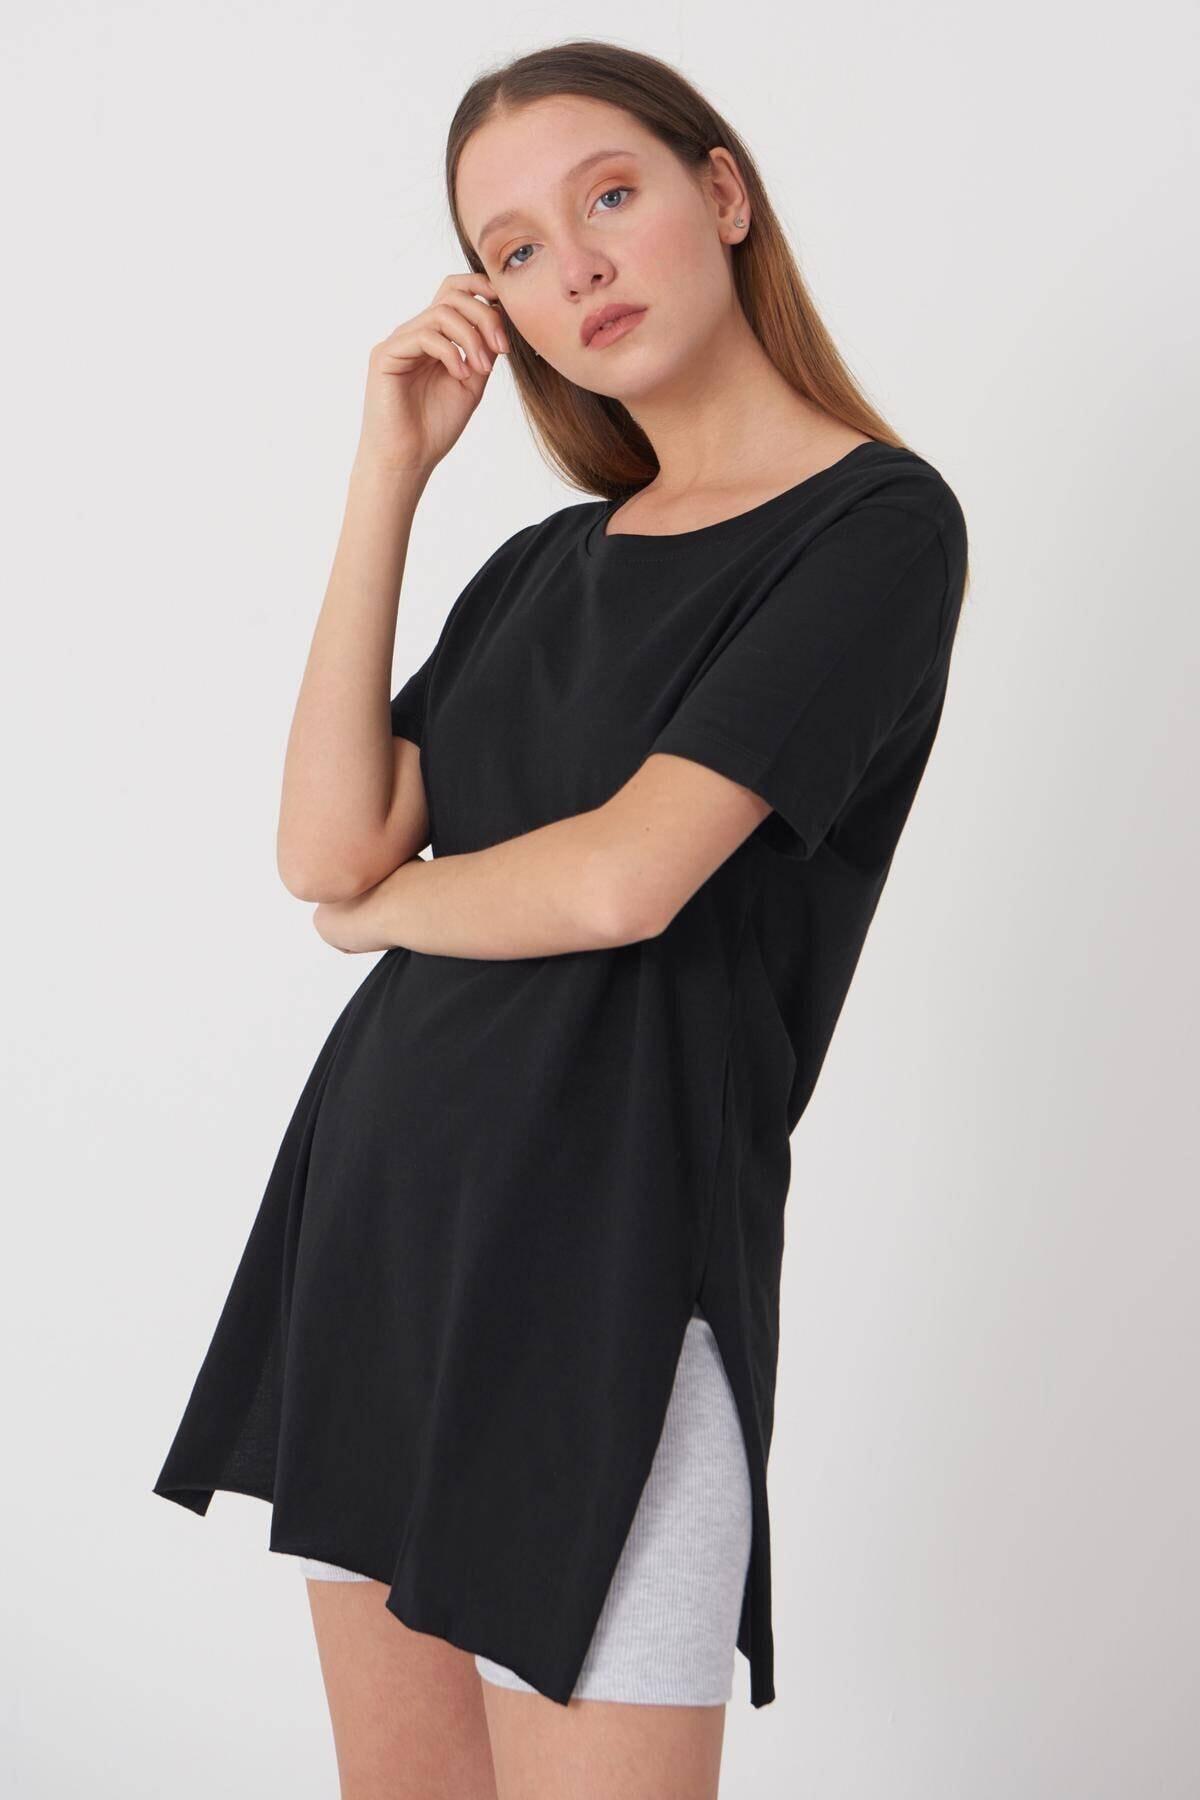 Addax Kadın Siyah Bisiklet Yaka T-Shirt P0101 - U4 - Z1 Adx-00007204 2